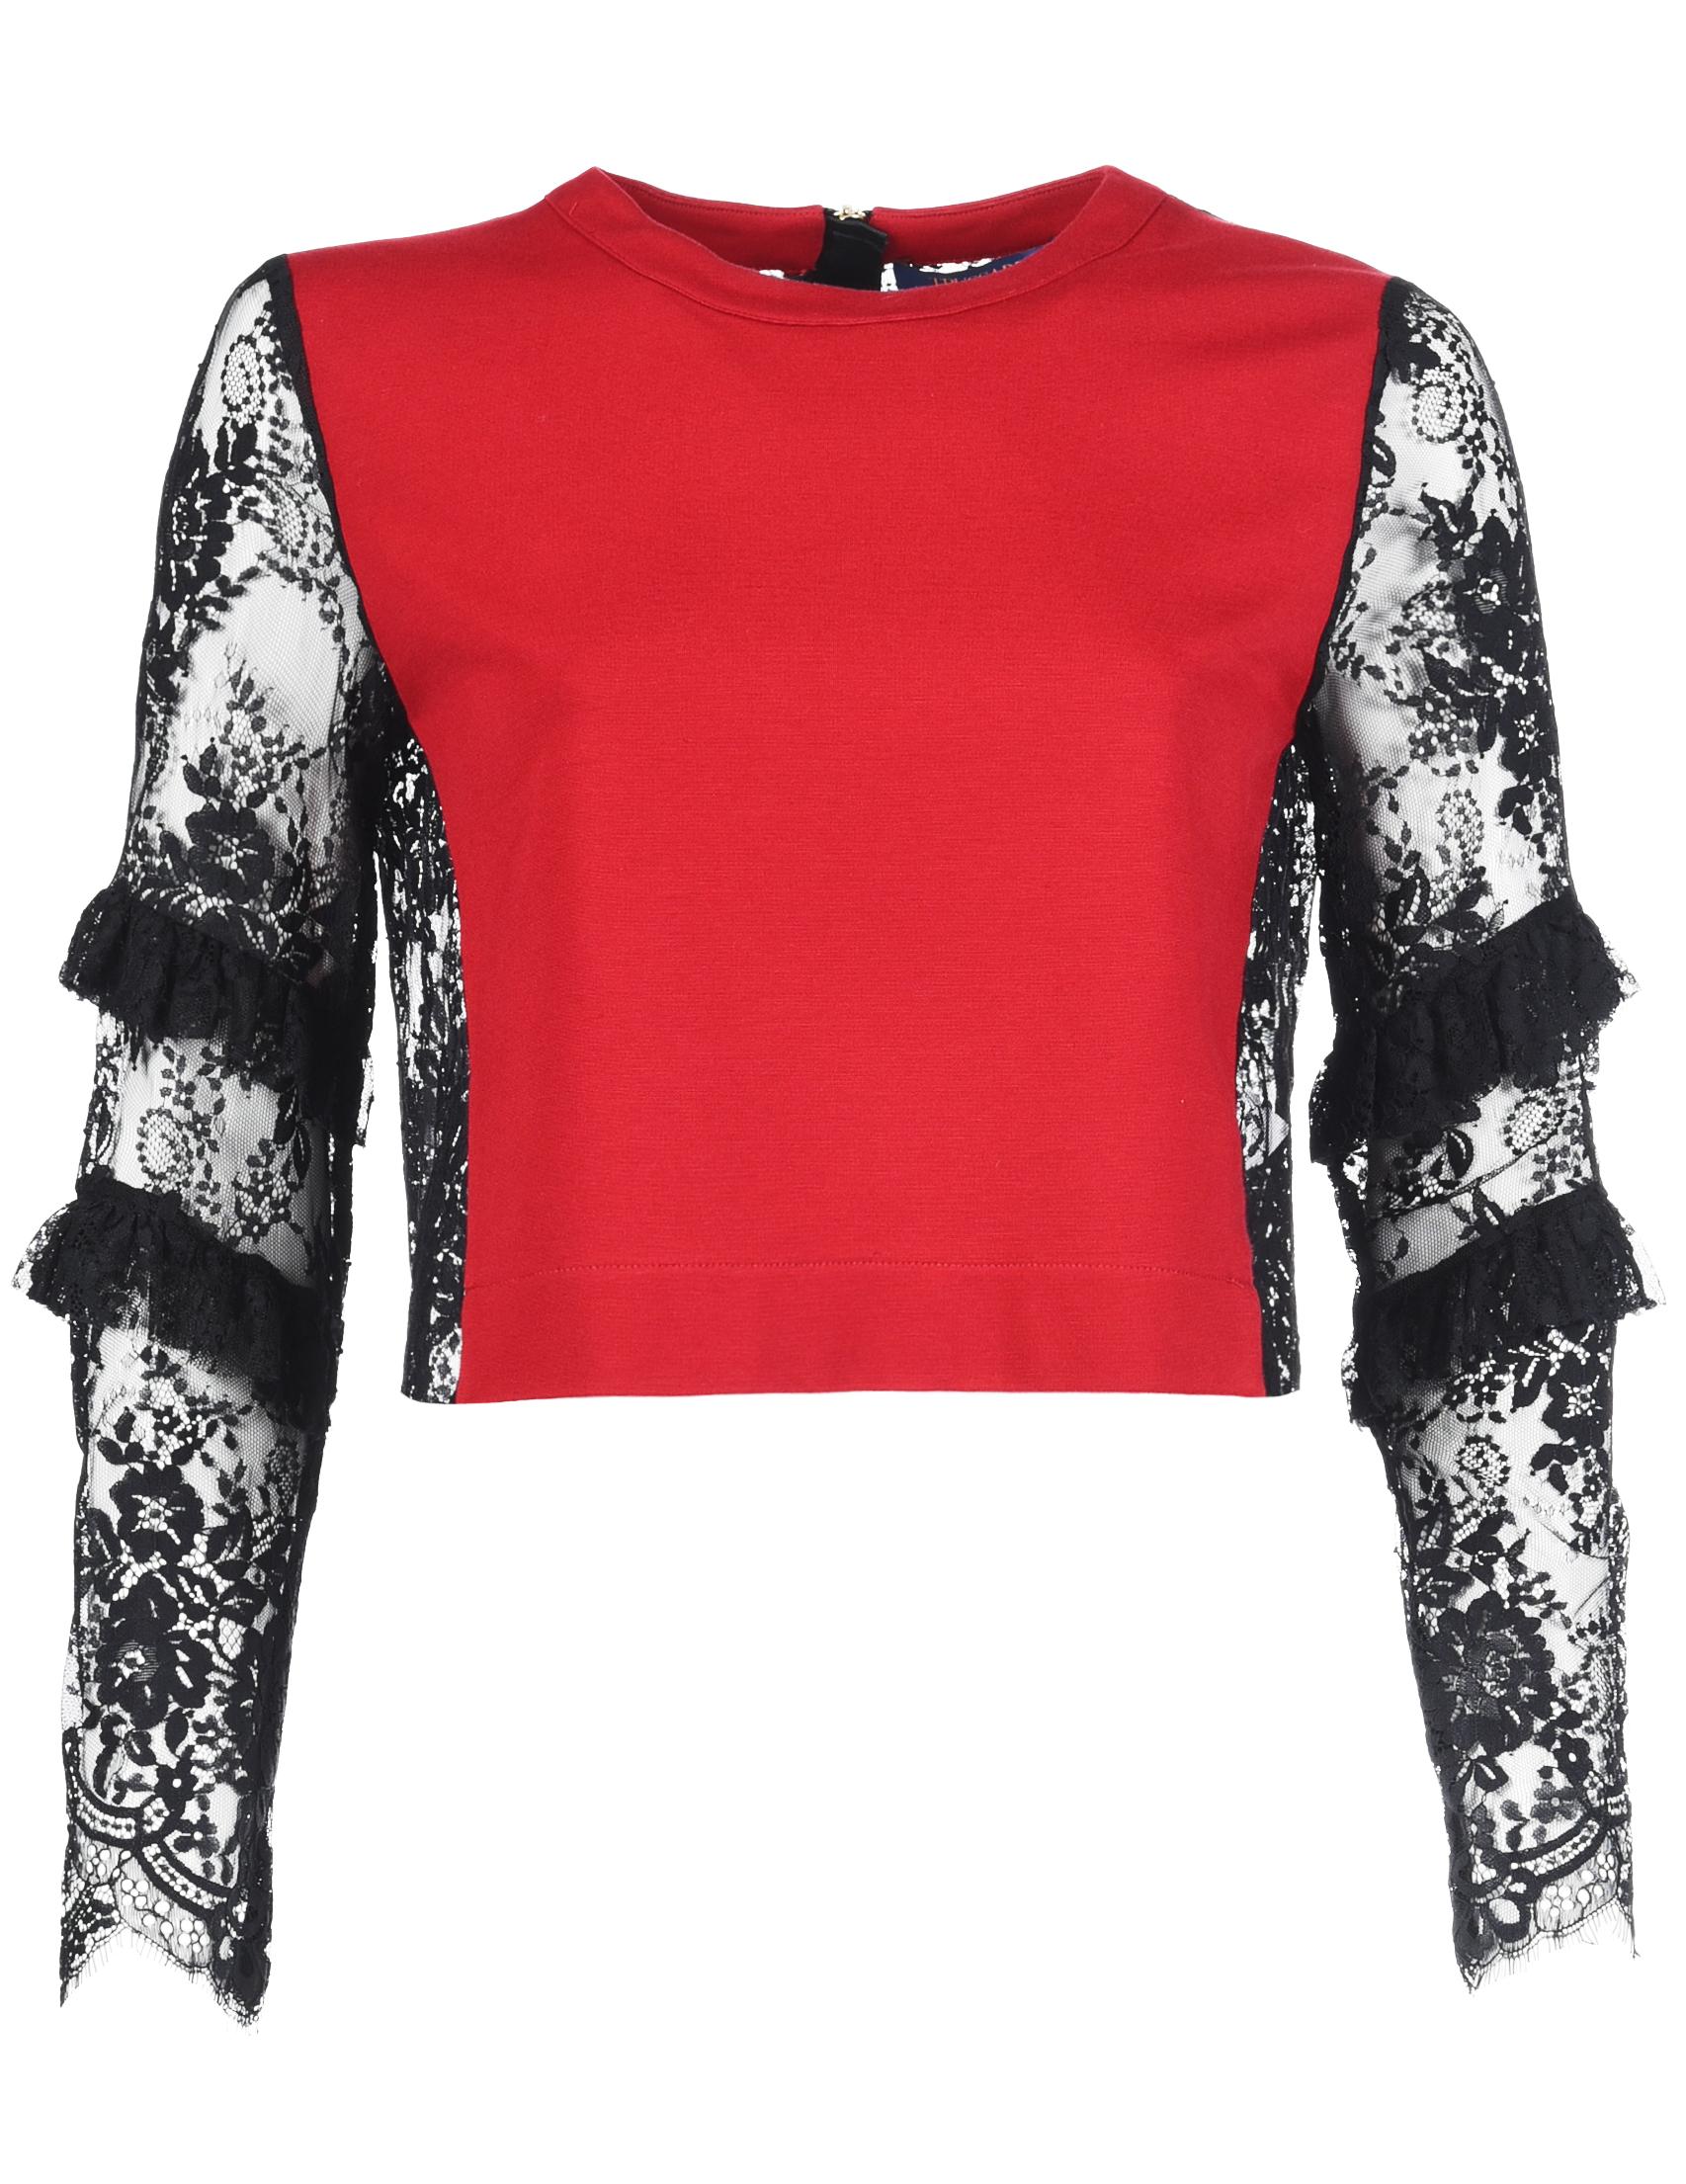 Блуза TRUSSARDI JEANS 56C001121T001509-R290